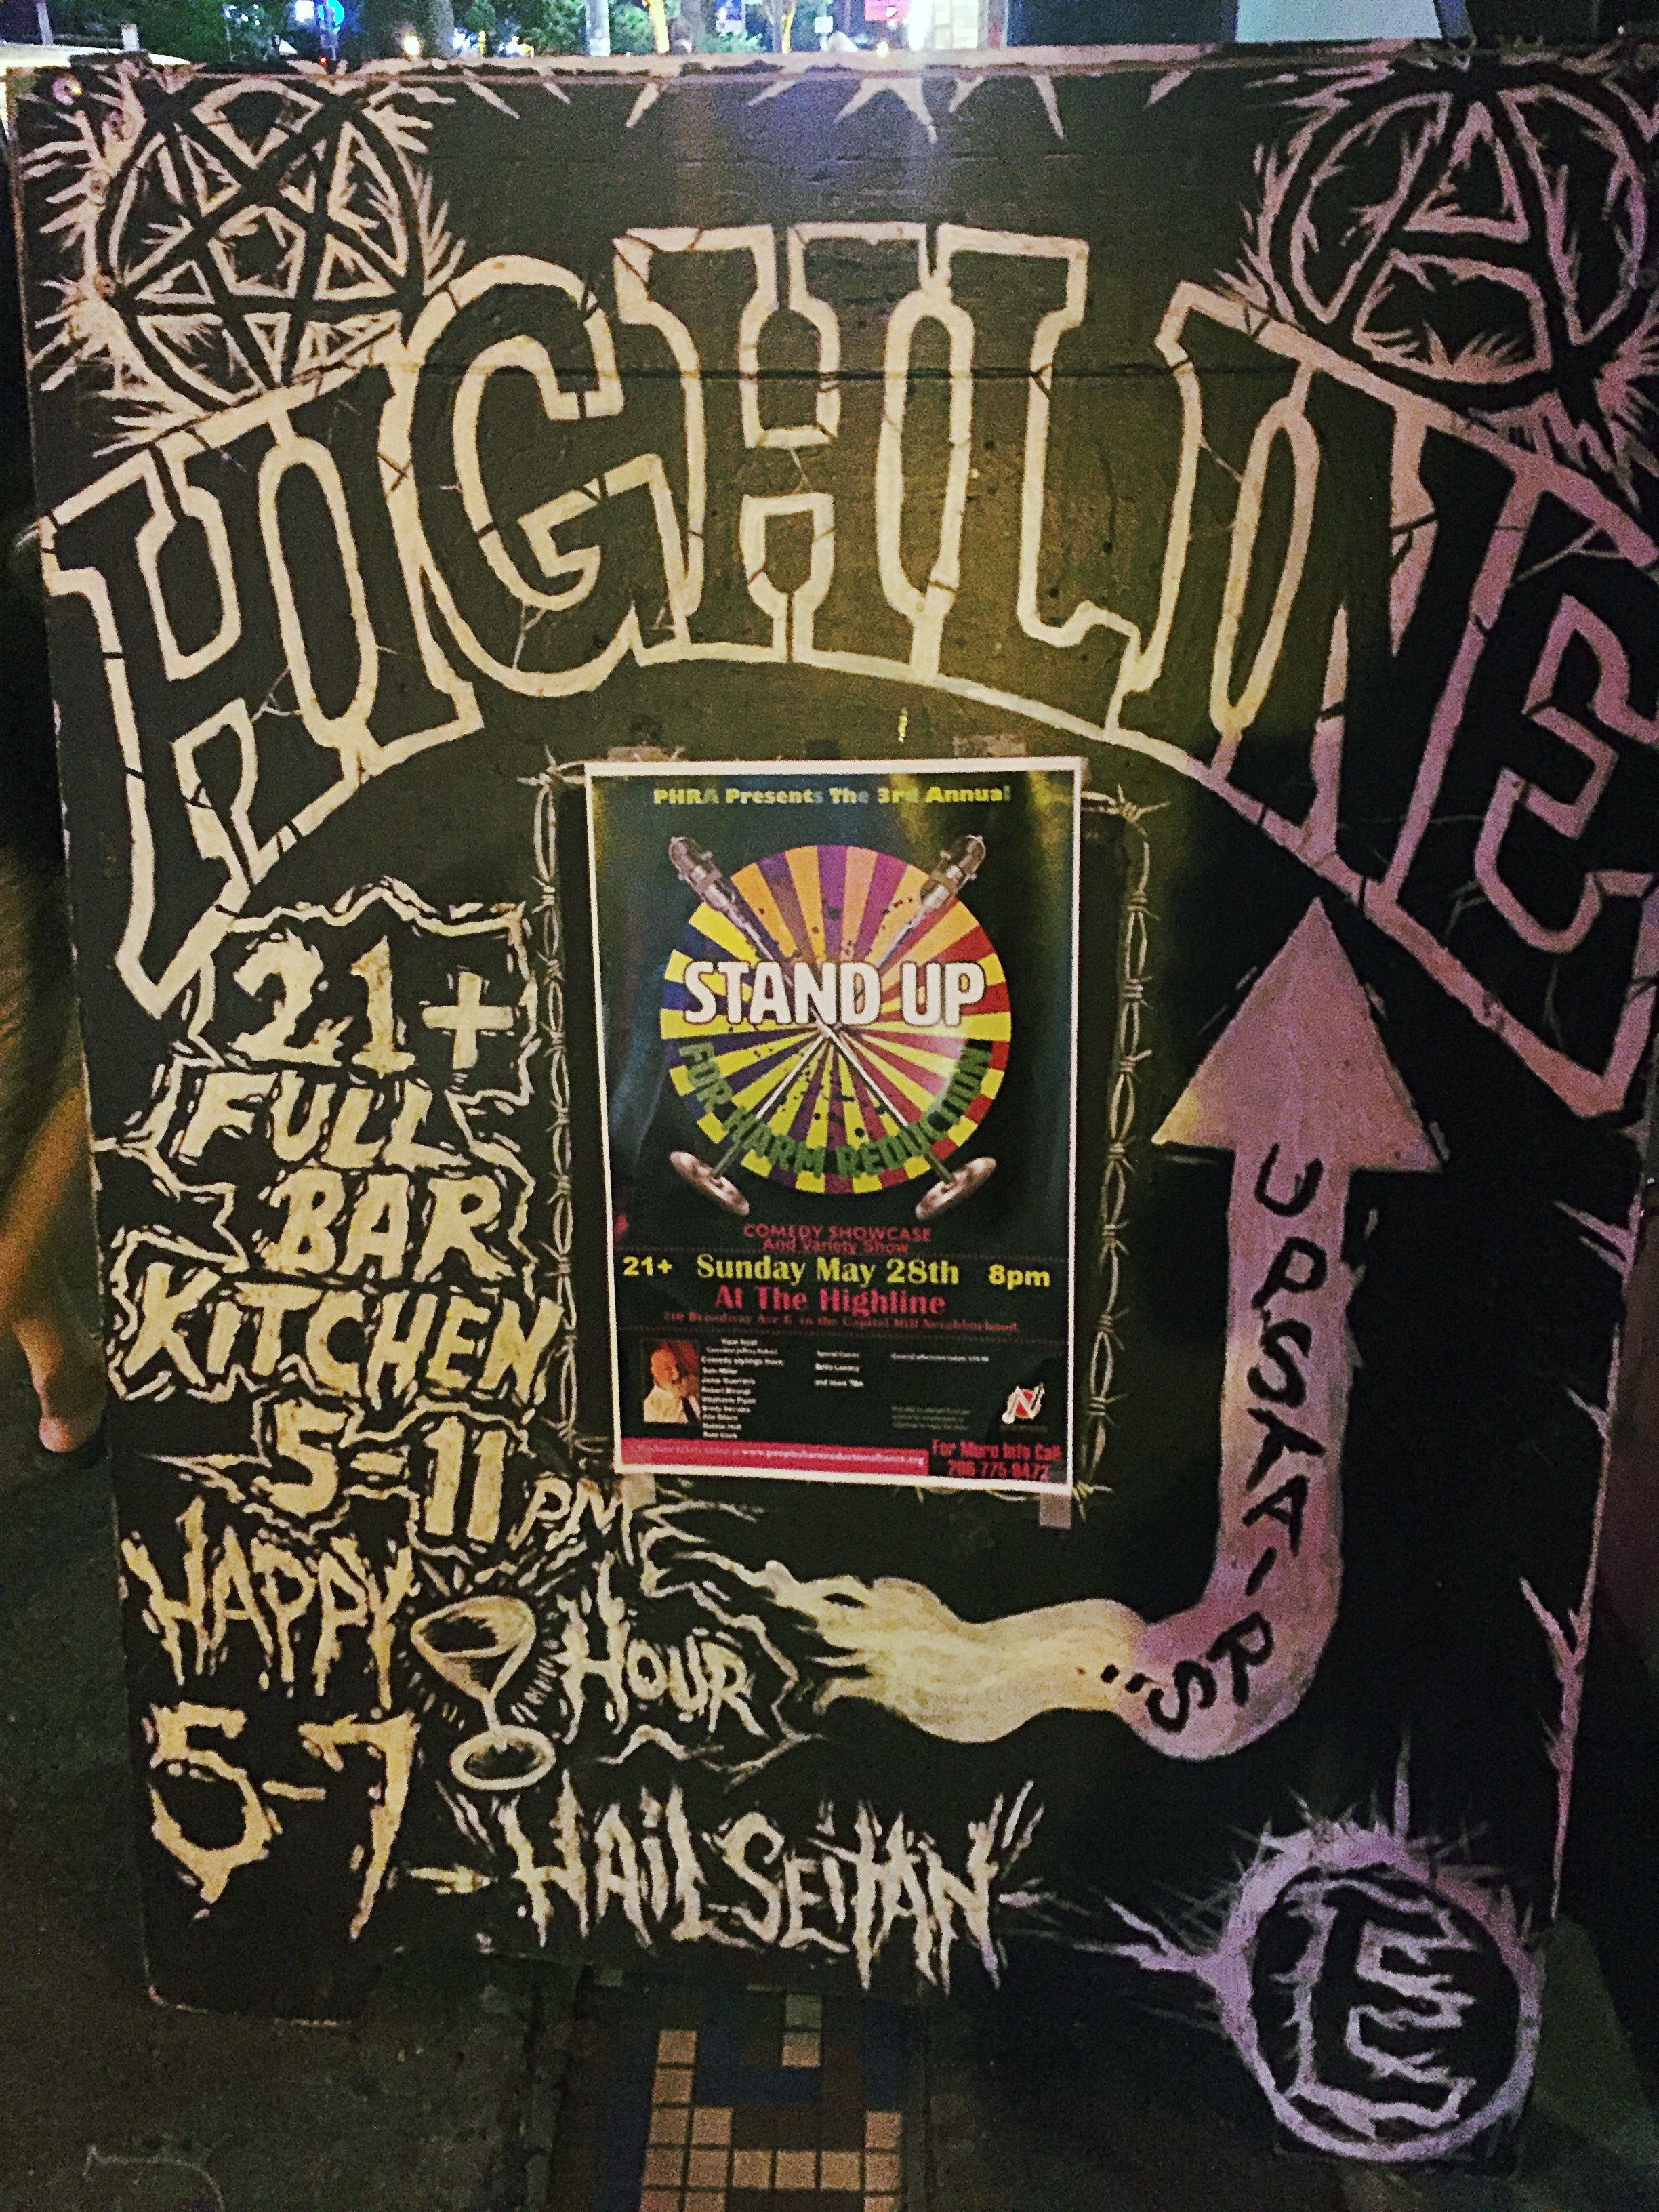 Highline Bar in Seattle, Washington's Capitol Hill neighborhood